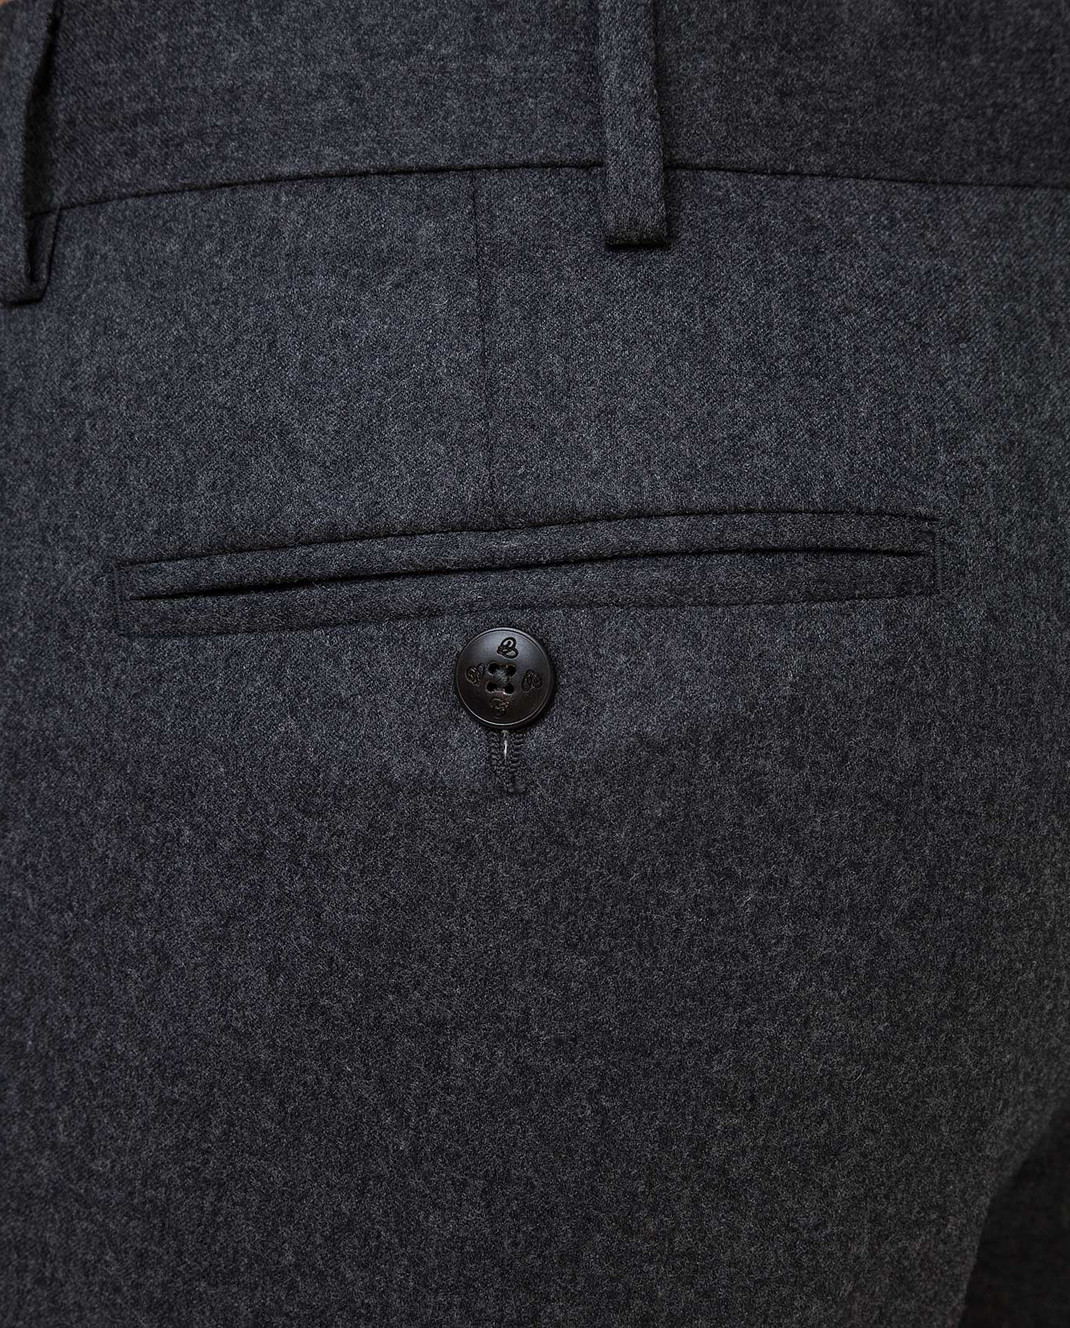 Castello d'Oro Темно-серые брюки из шерсти изображение 5